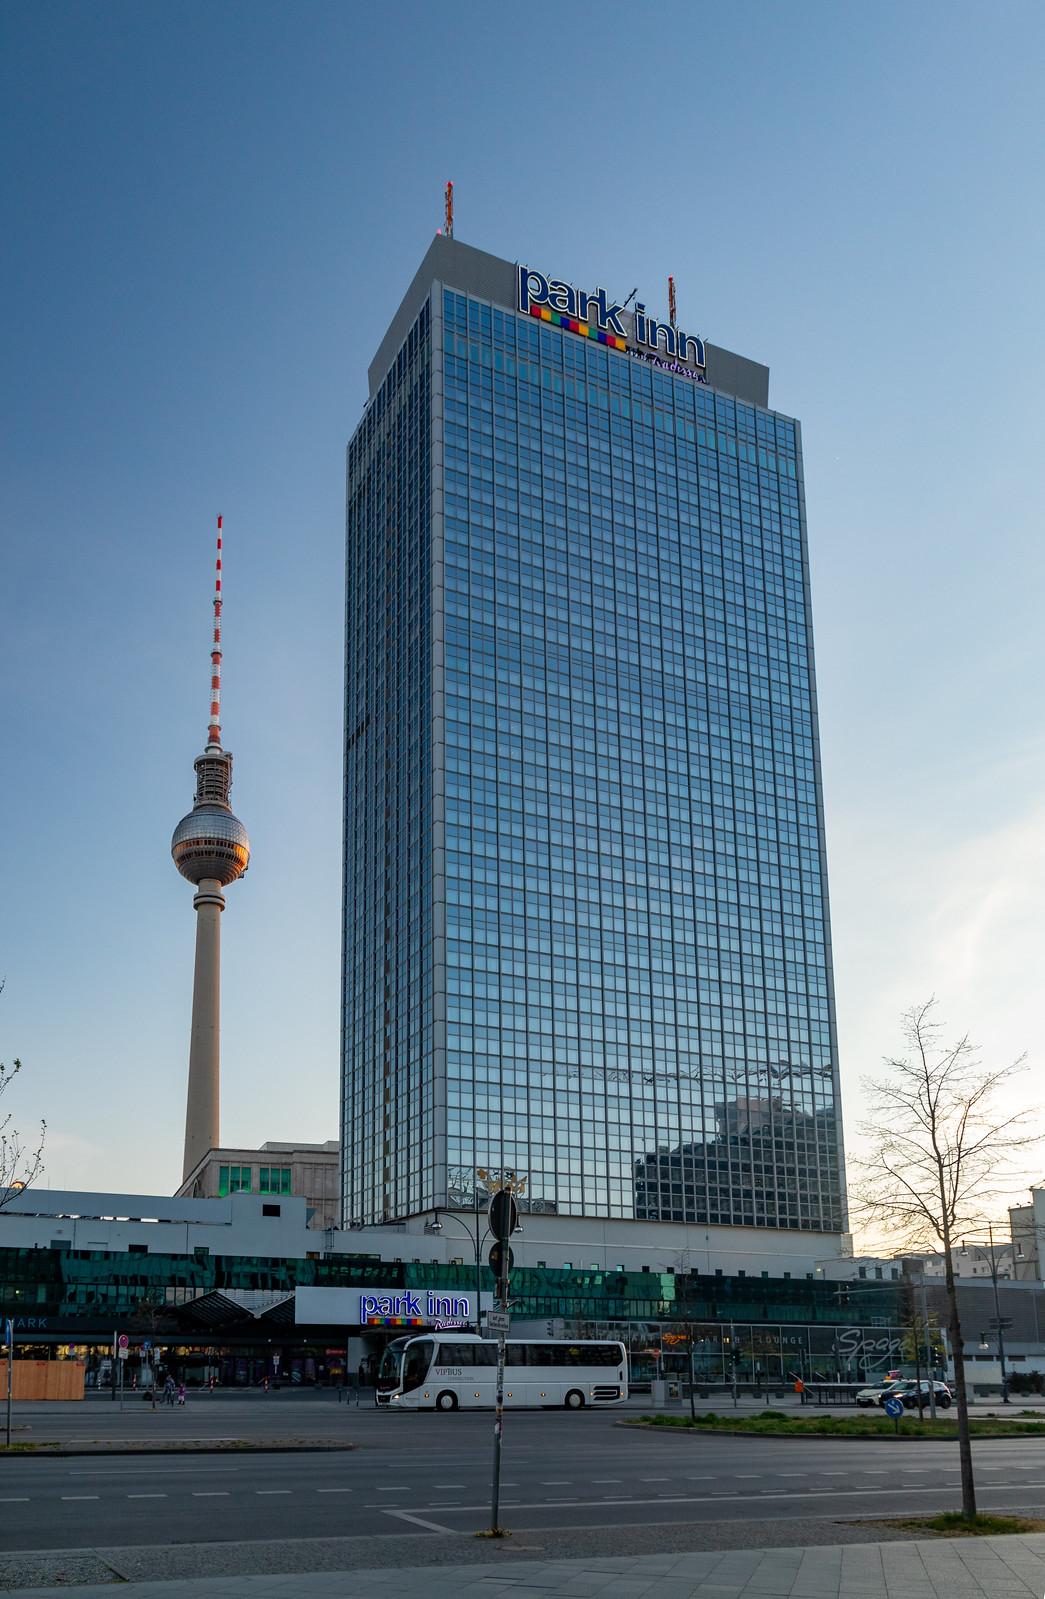 Park-Inn-Hotel & Fernsehturm